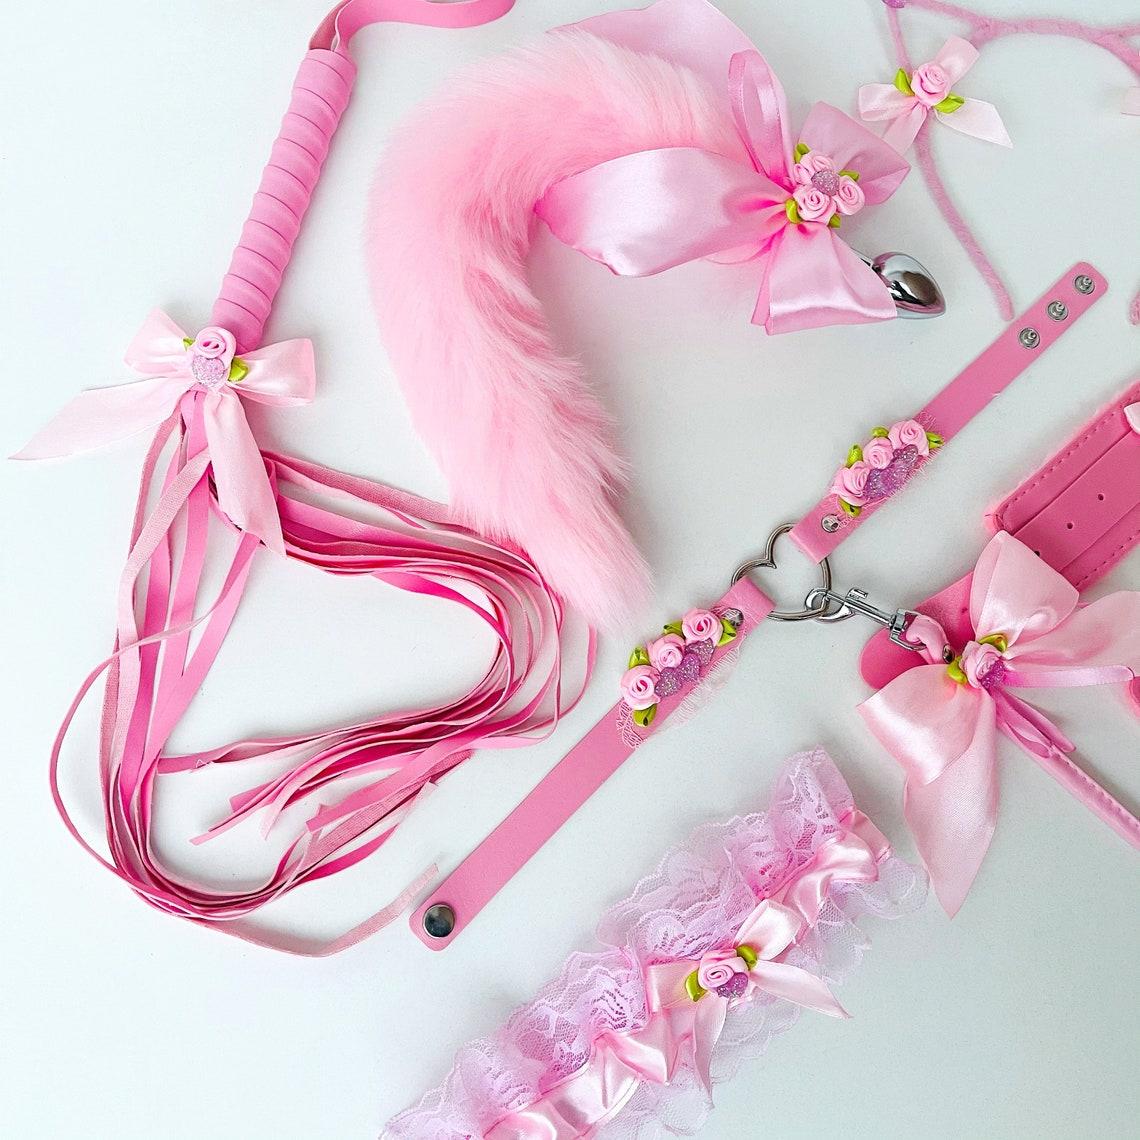 Sexy Pink Kitty set Cup Bdsm Sexy Kitten Costume. Bdsm Pet